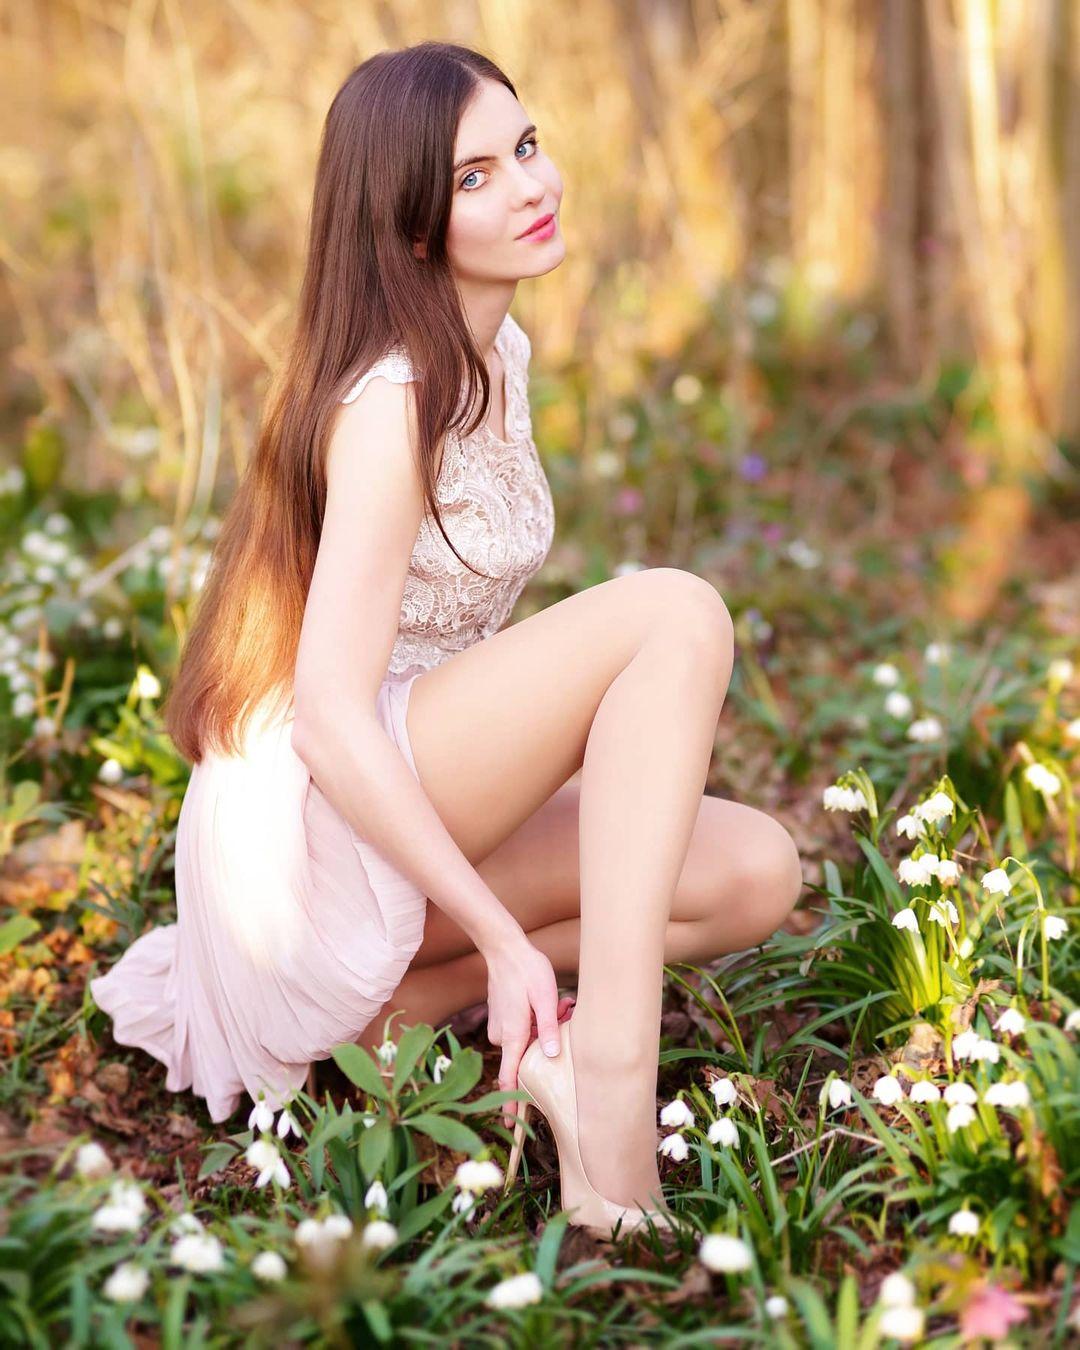 Ariadna - девушка дня из инстаграм (27 Фото) 11